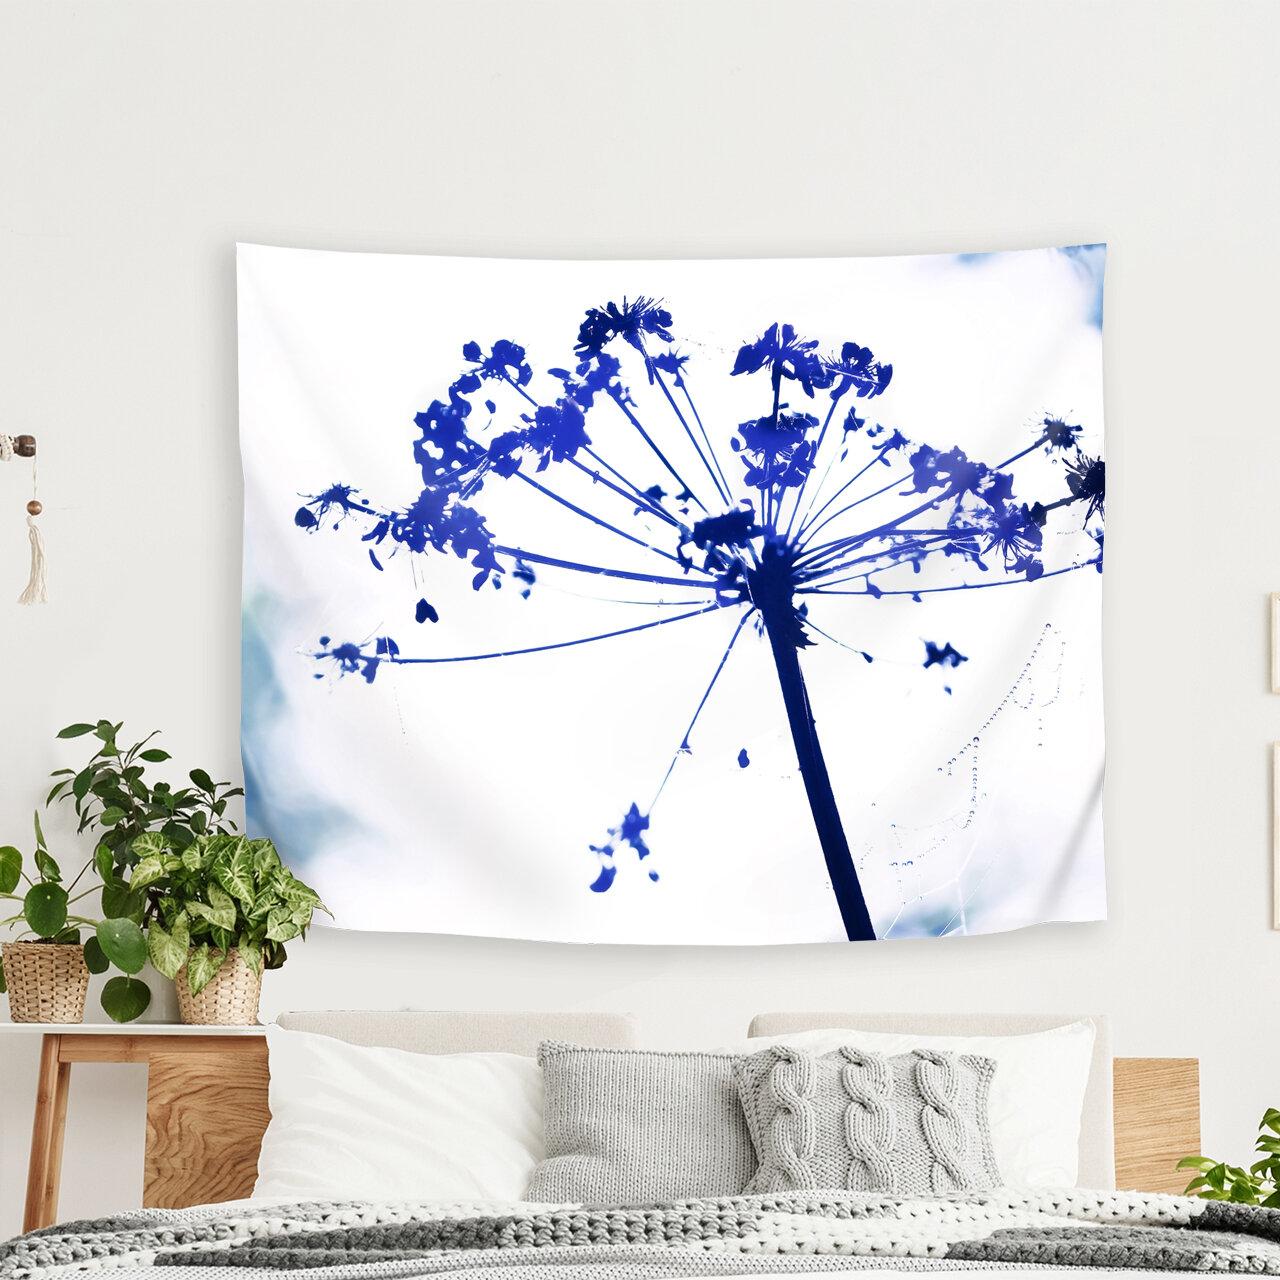 East Urban Home Mirja Paljakka For Winter Tapestry Wayfair